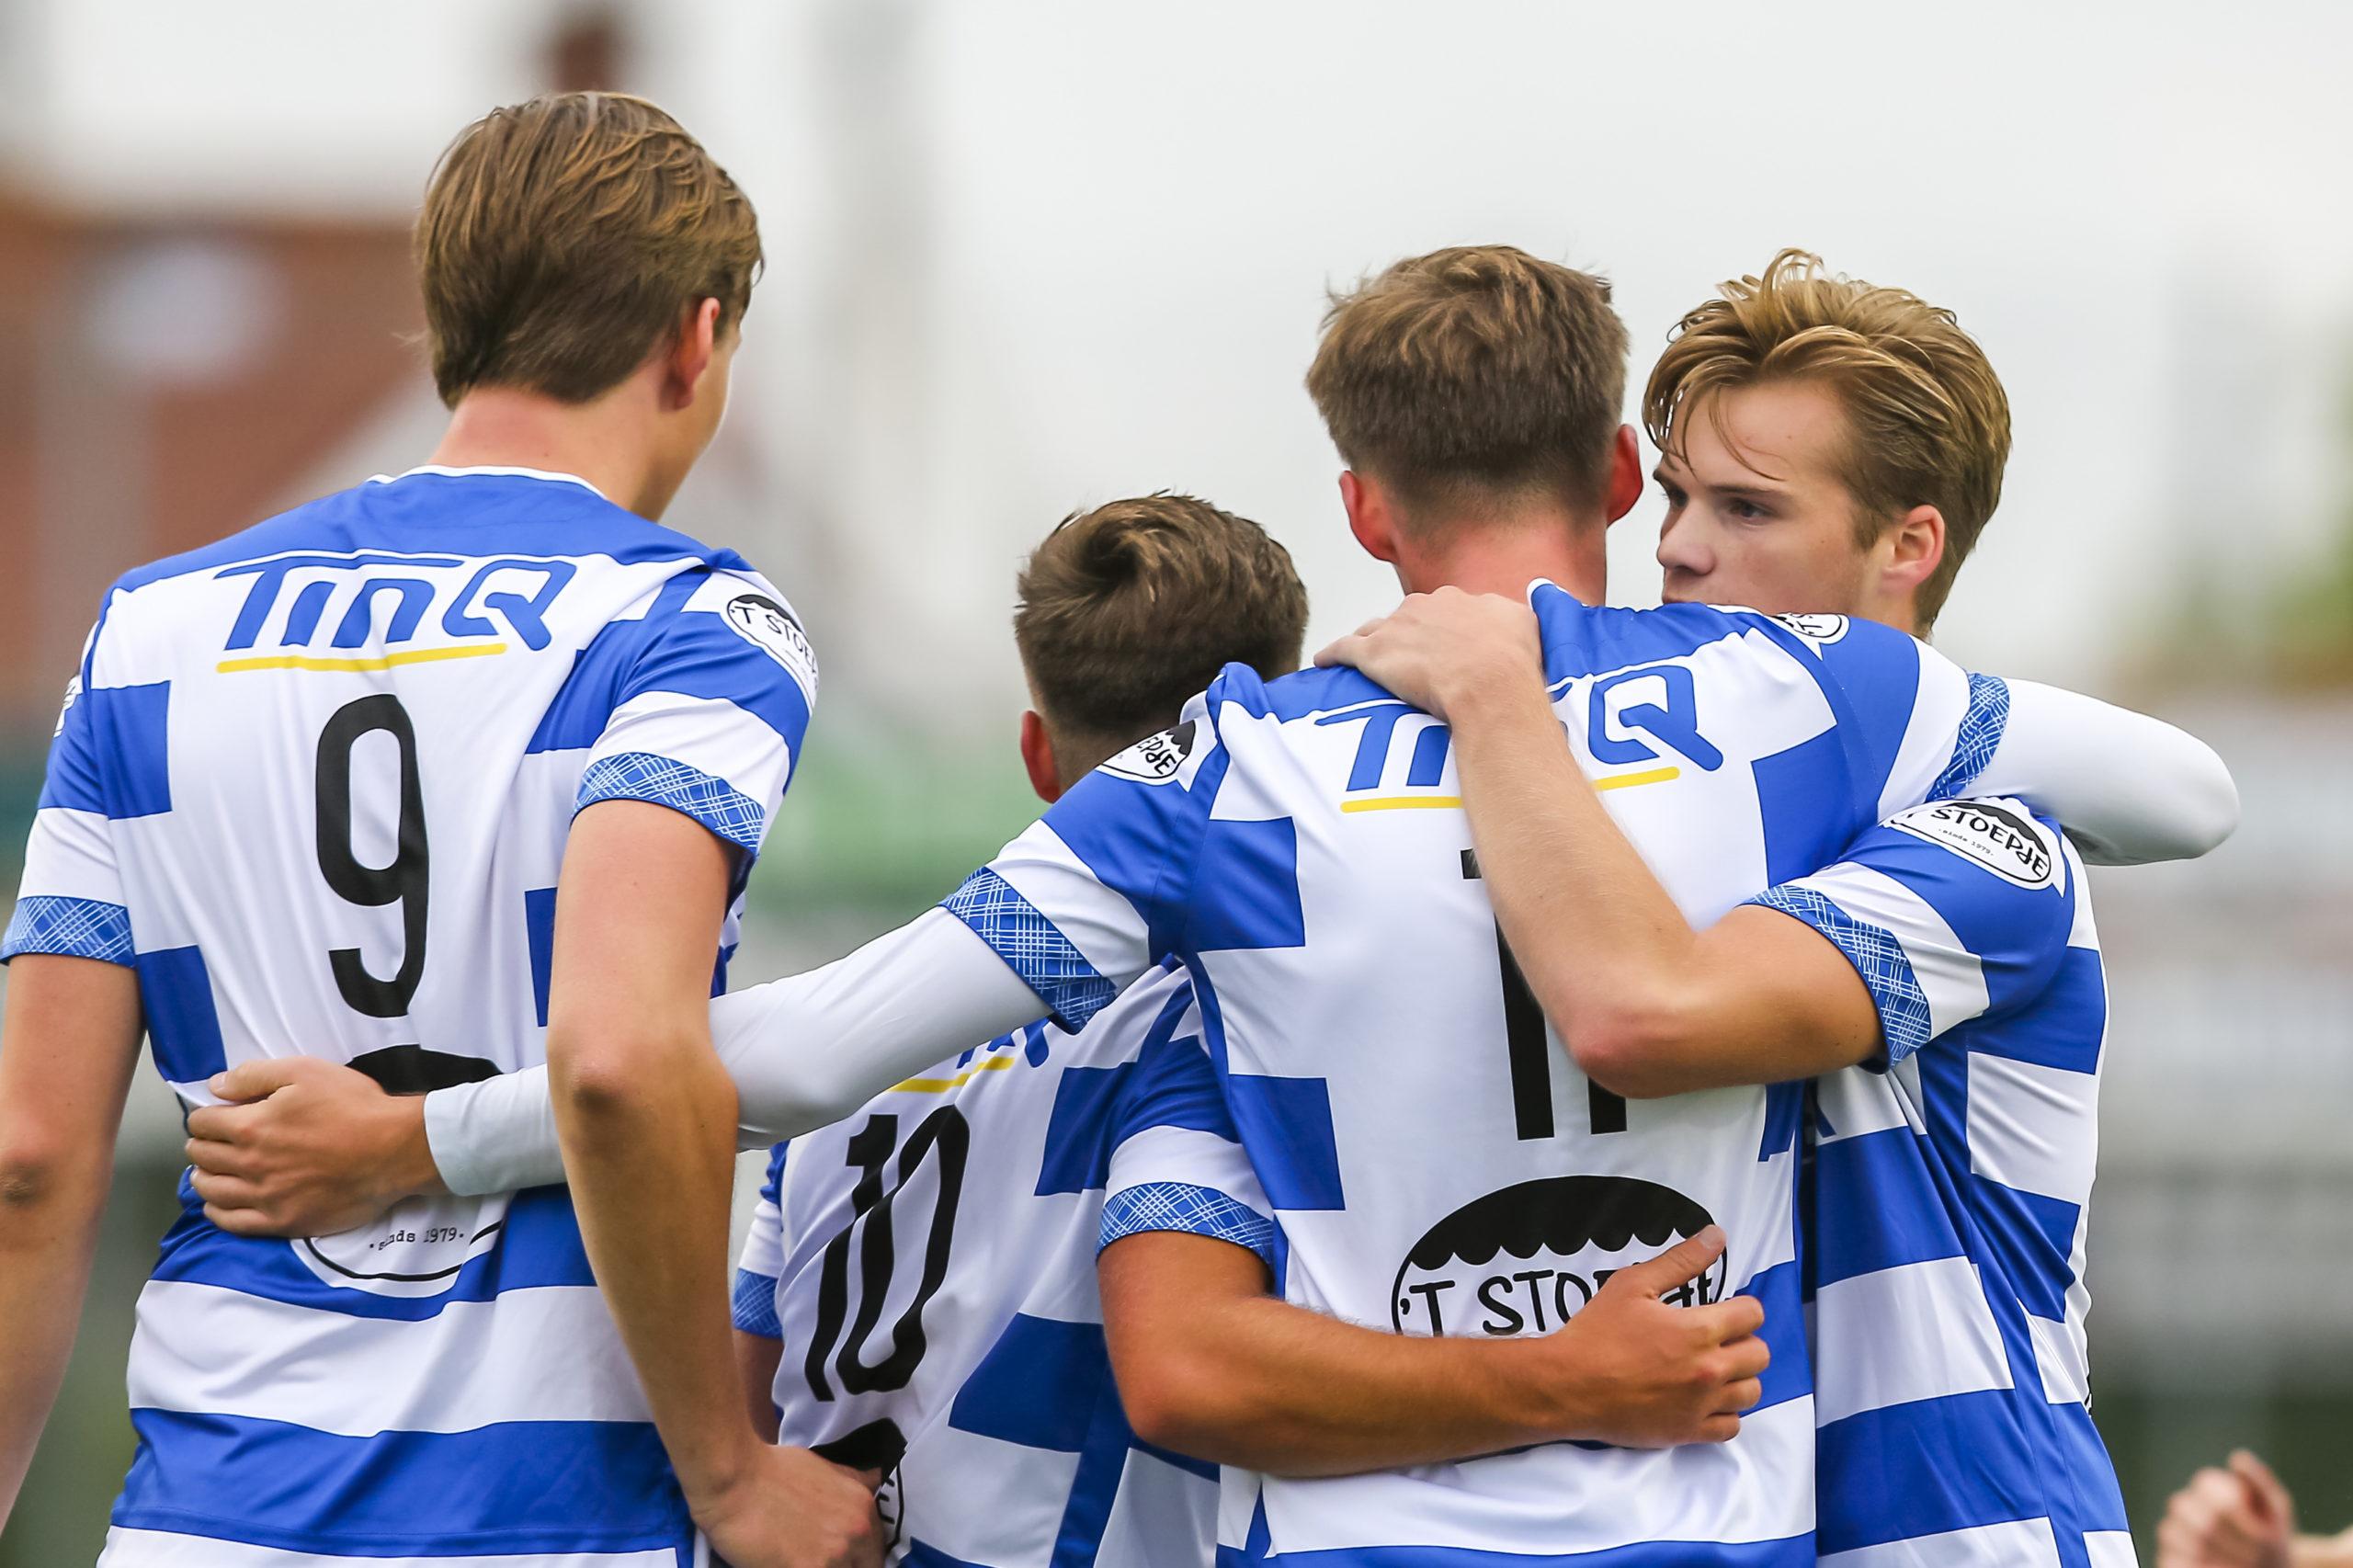 TinQ en 't Stoepje hoofdsponsors talentteam 0-23